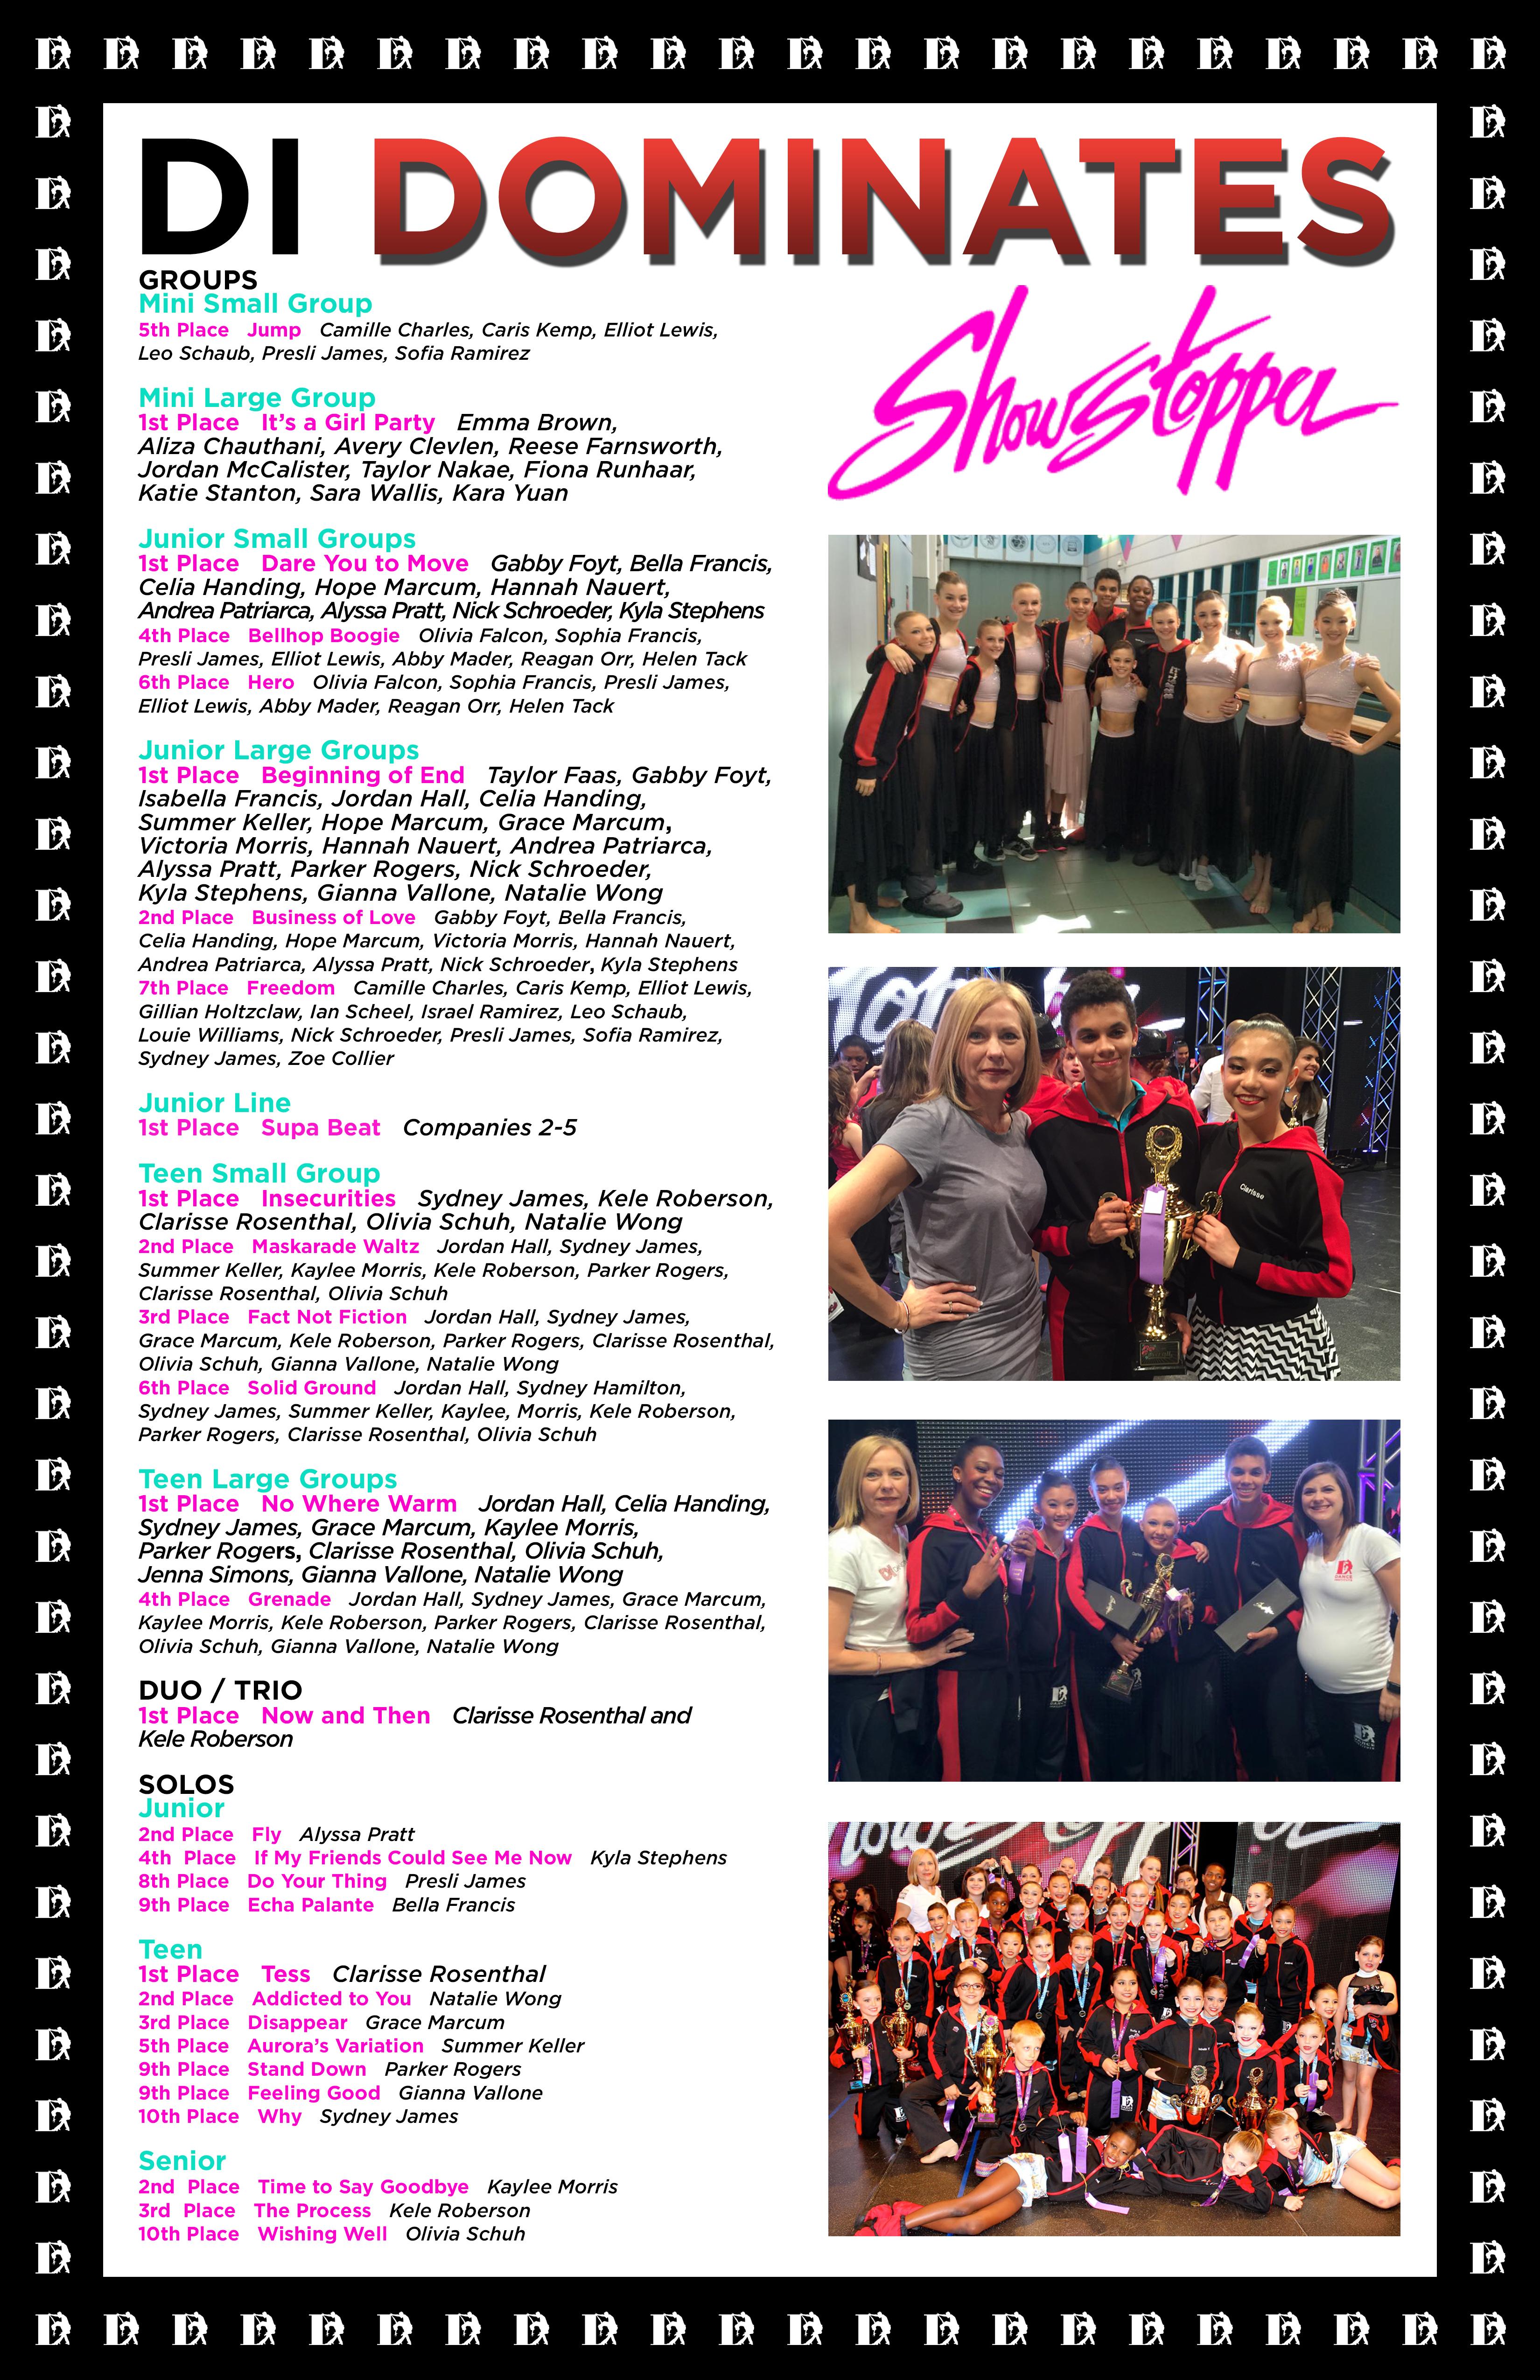 Showstopper 2015 Results.jpg